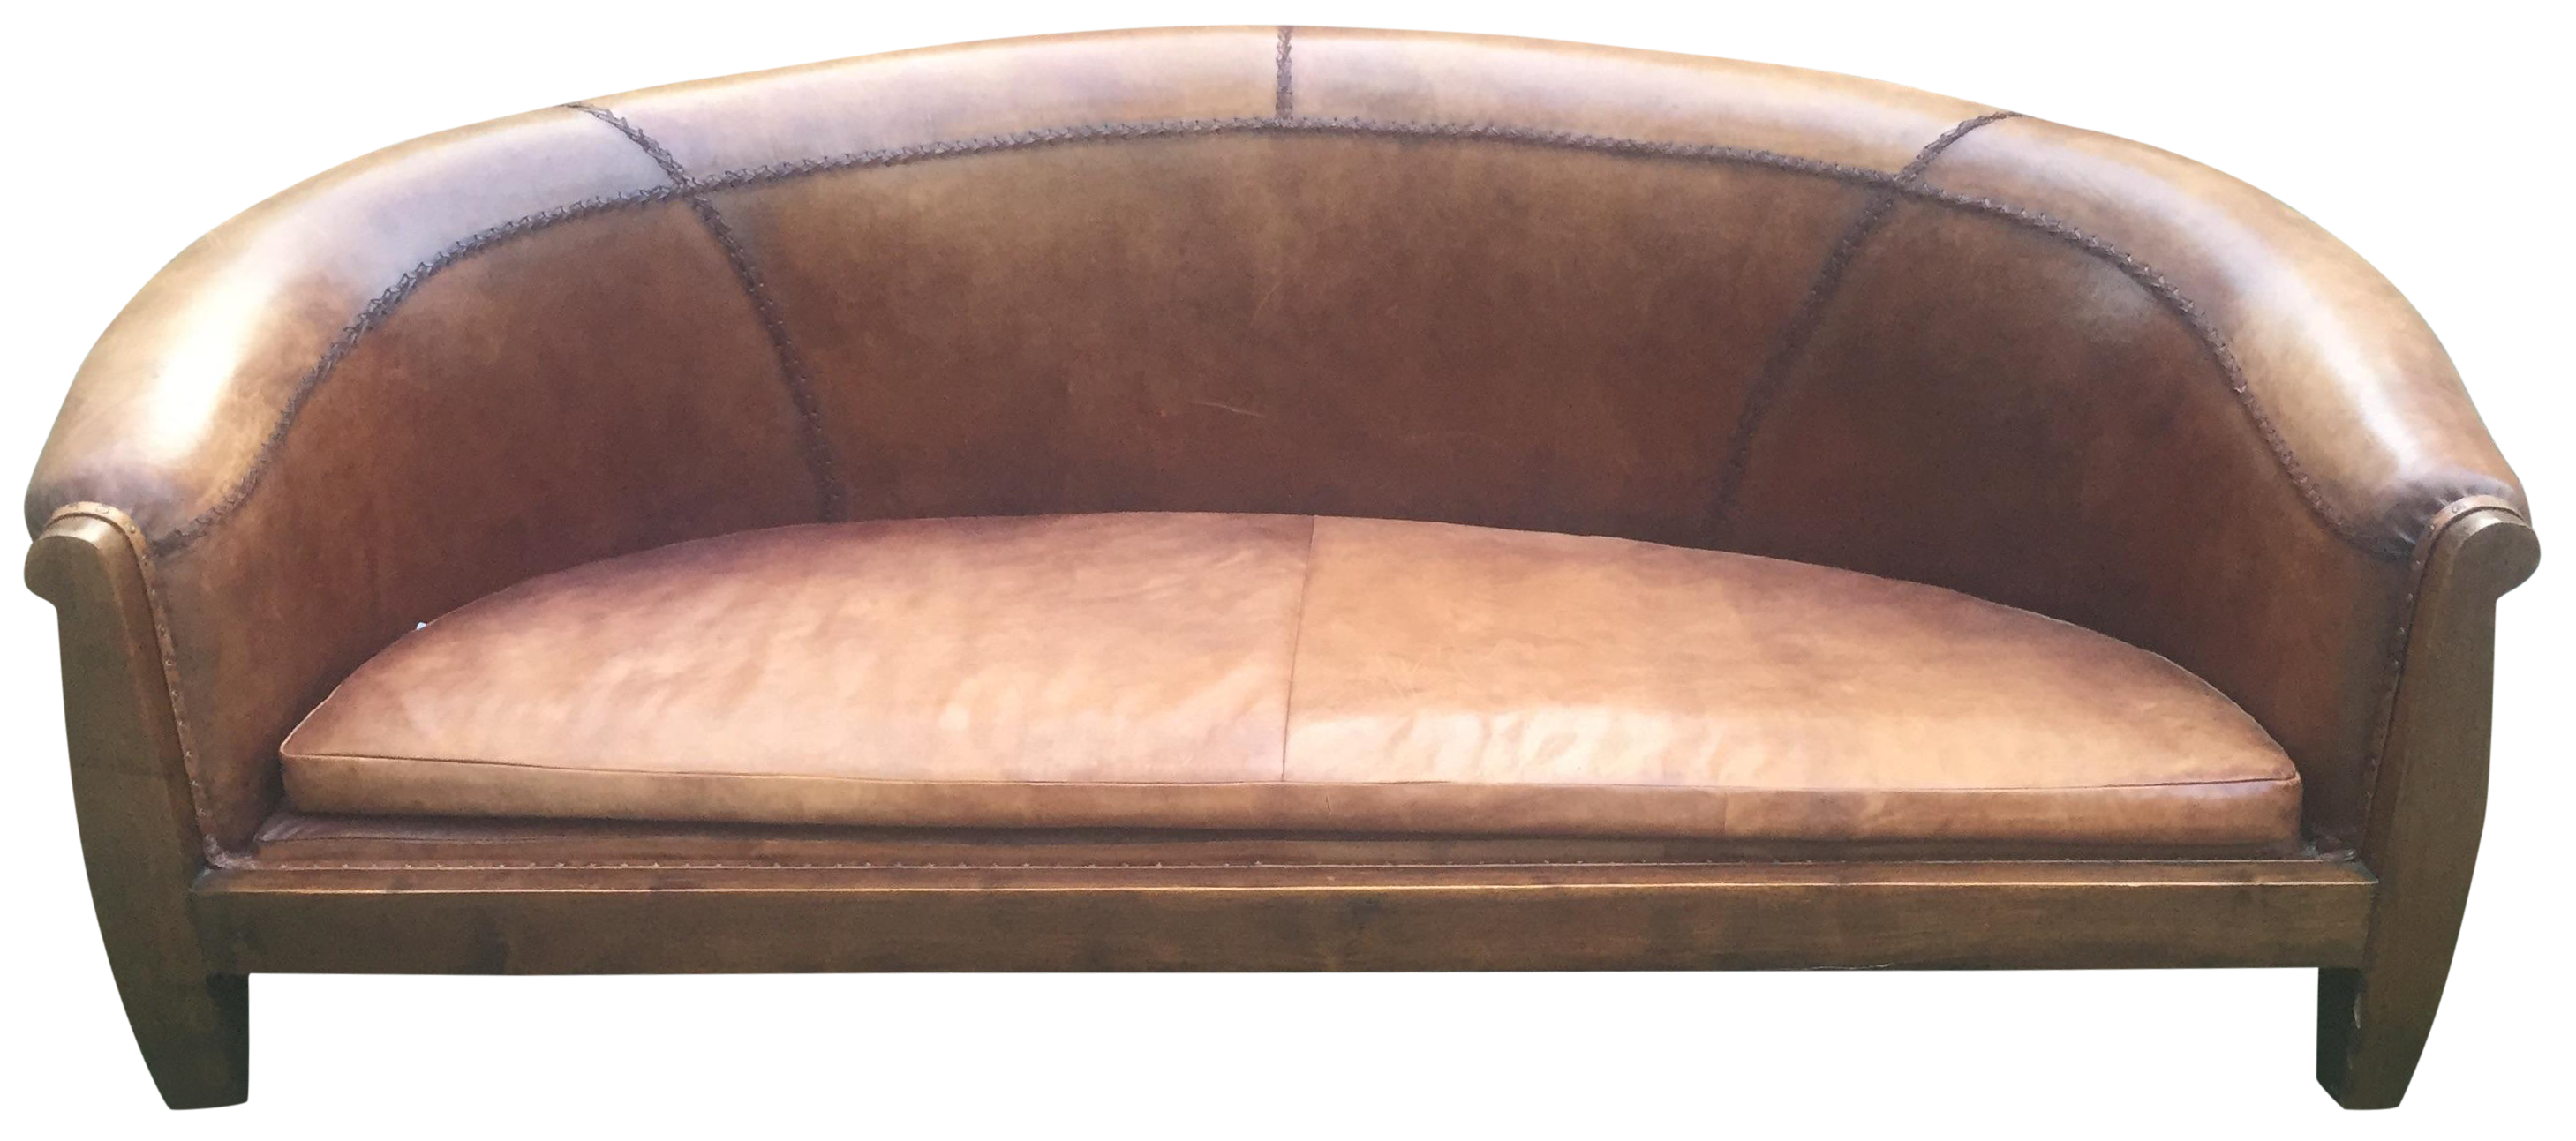 South Asian Leather Sofa On Chairish Com Leather Sofa Chair Decor